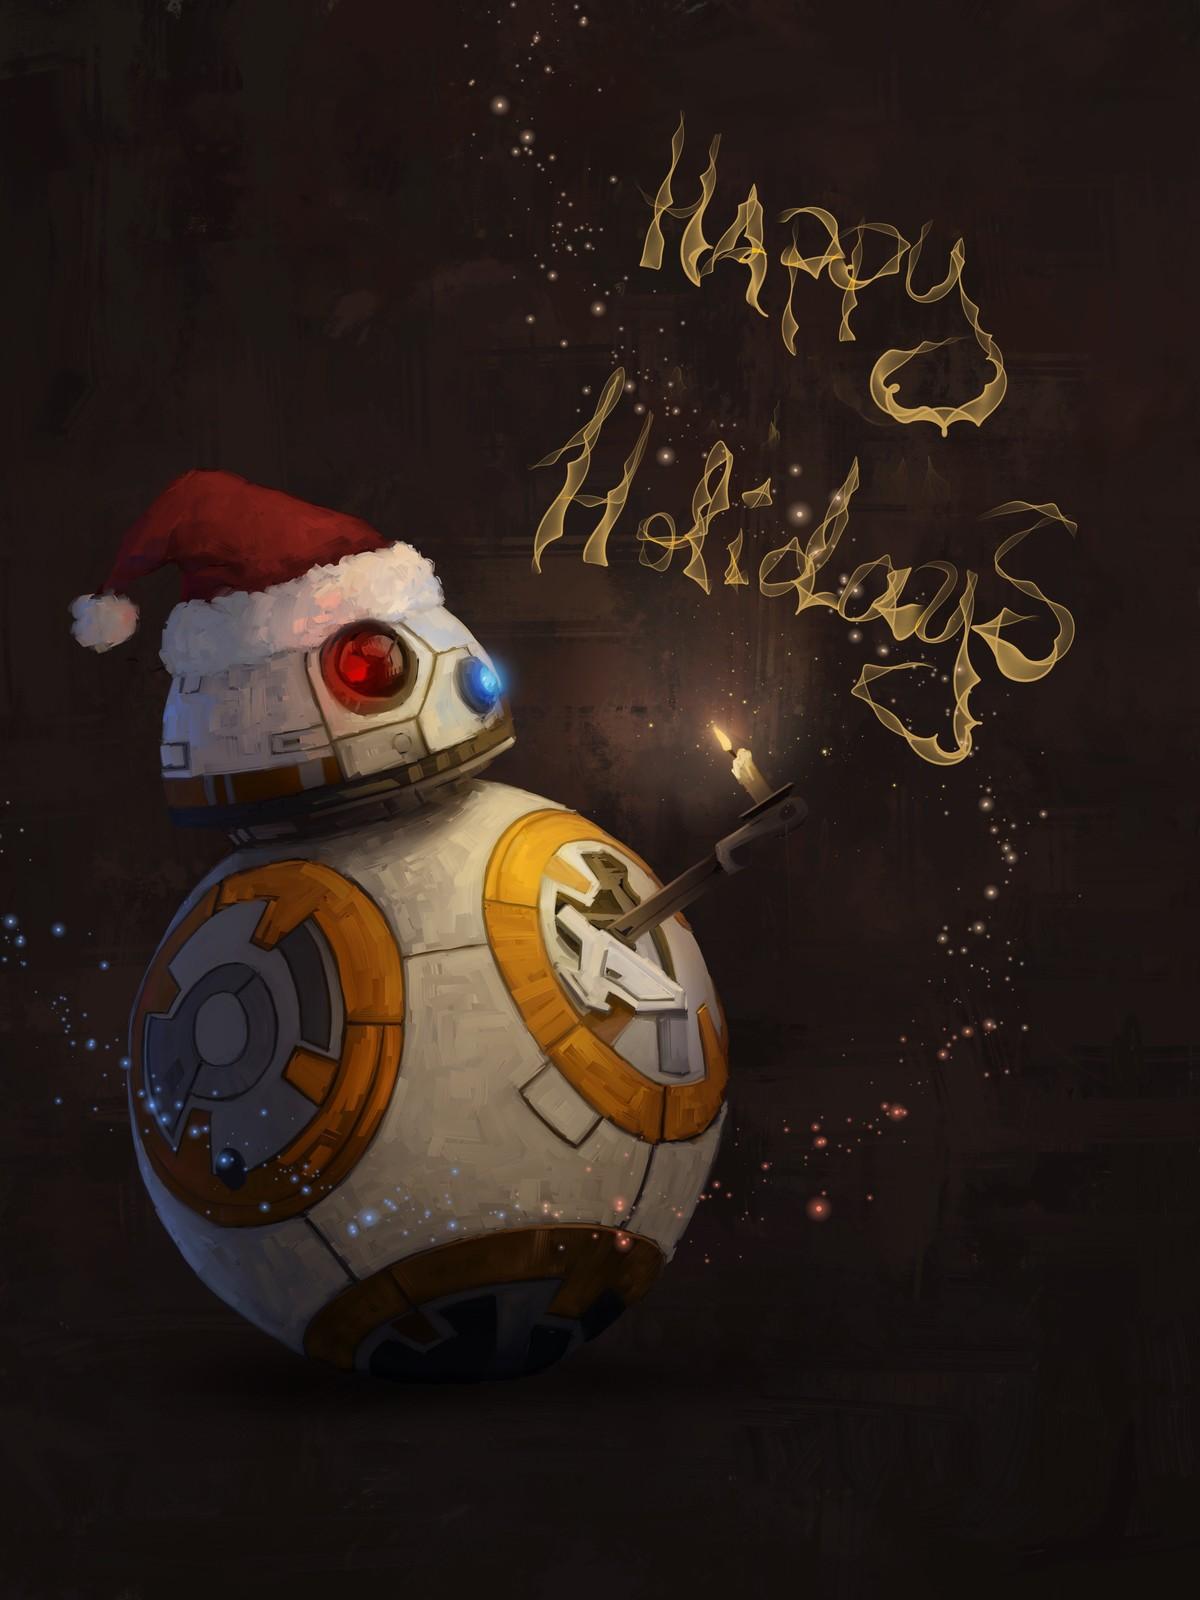 StarWars Fanart Christmas illustration